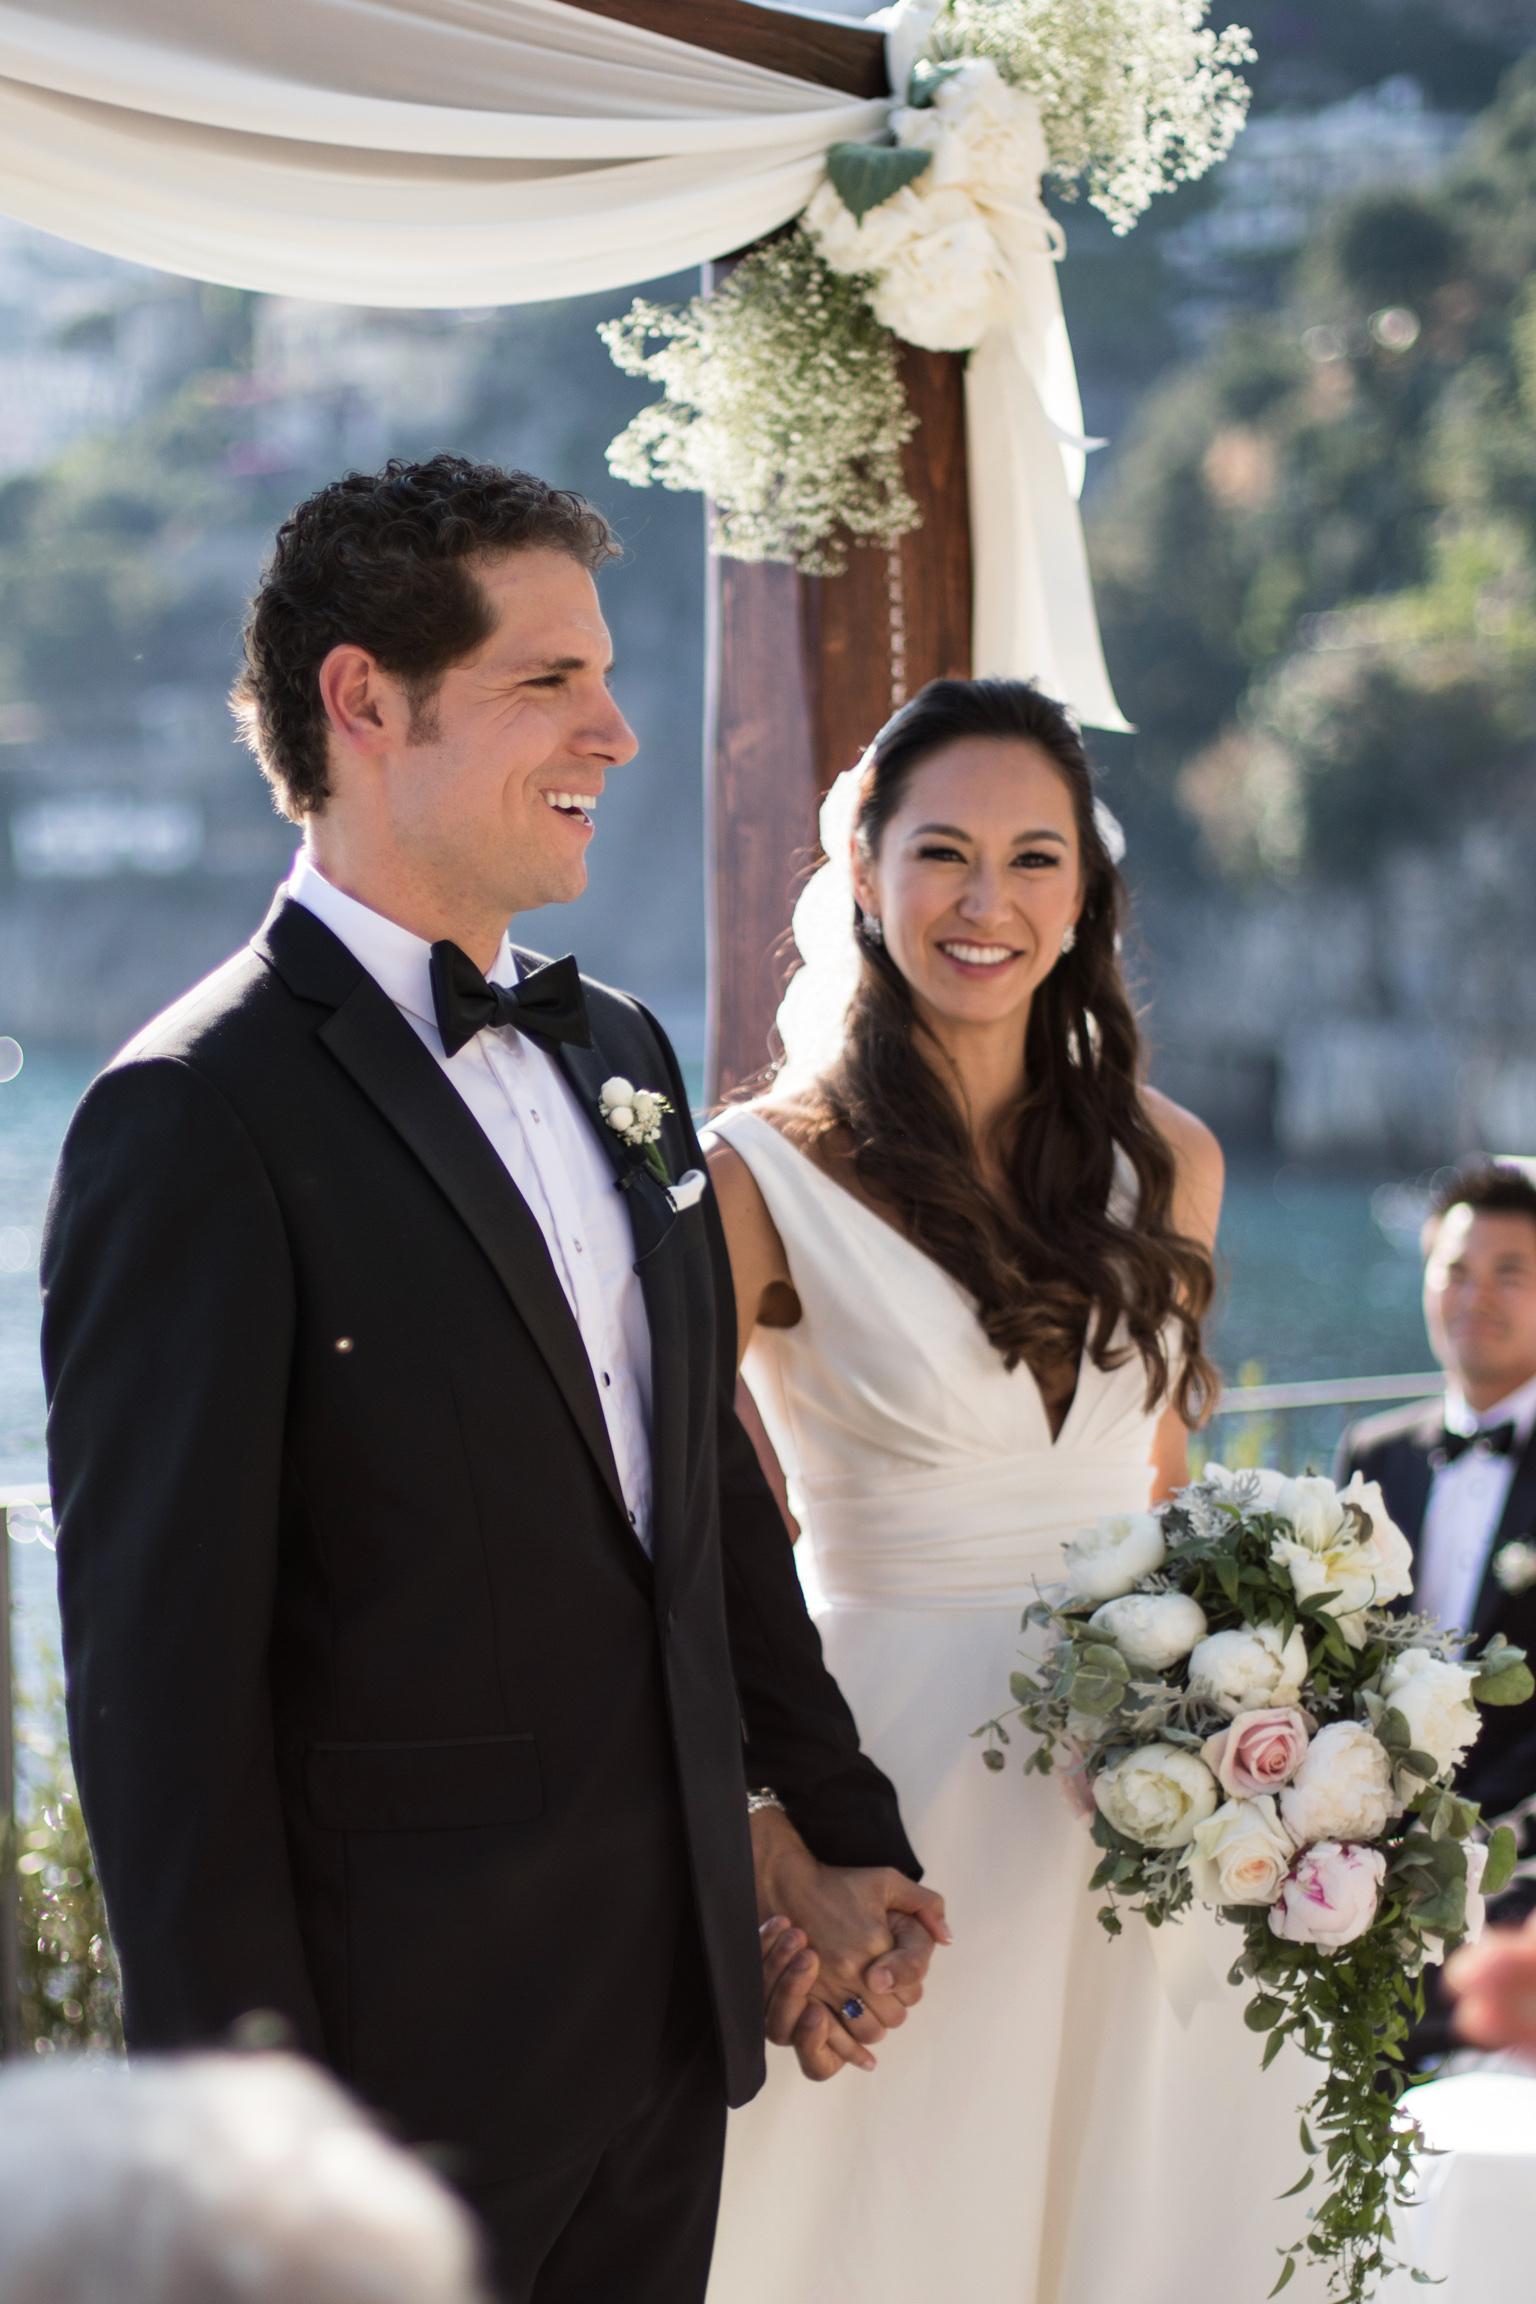 http://www.weddingamalfi.com/wp-content/uploads/Nathalie-and-Benjamin-Wedding-in-Positano-Italy-29.jpg